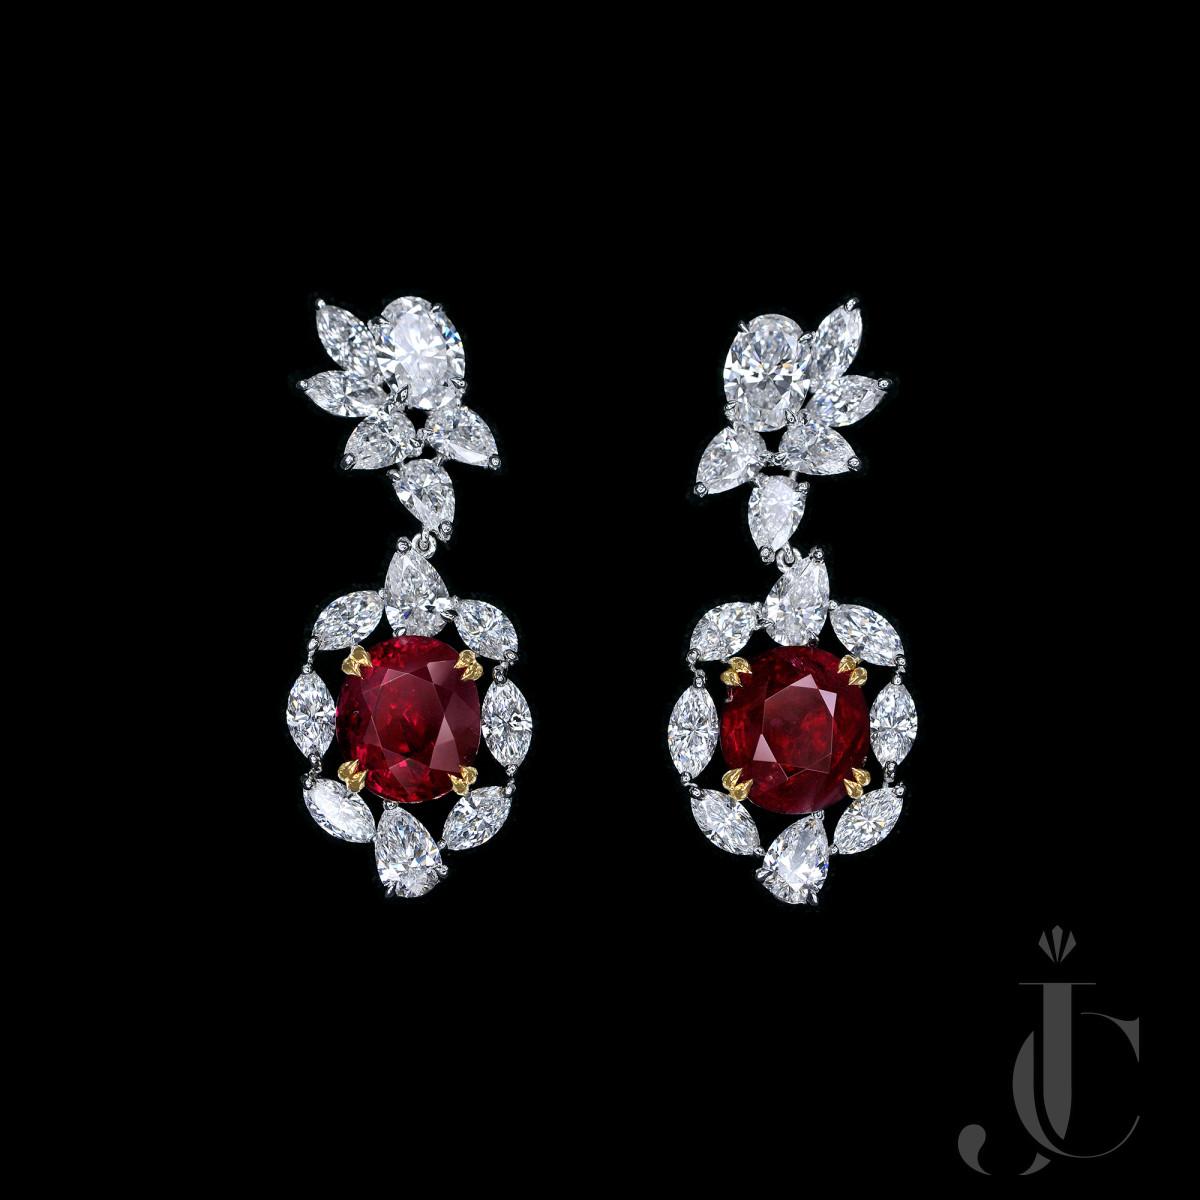 Unheated Pigeon Blood Burmese Ruby Diamond Earrings, GRS/GUB/SSEF certs available